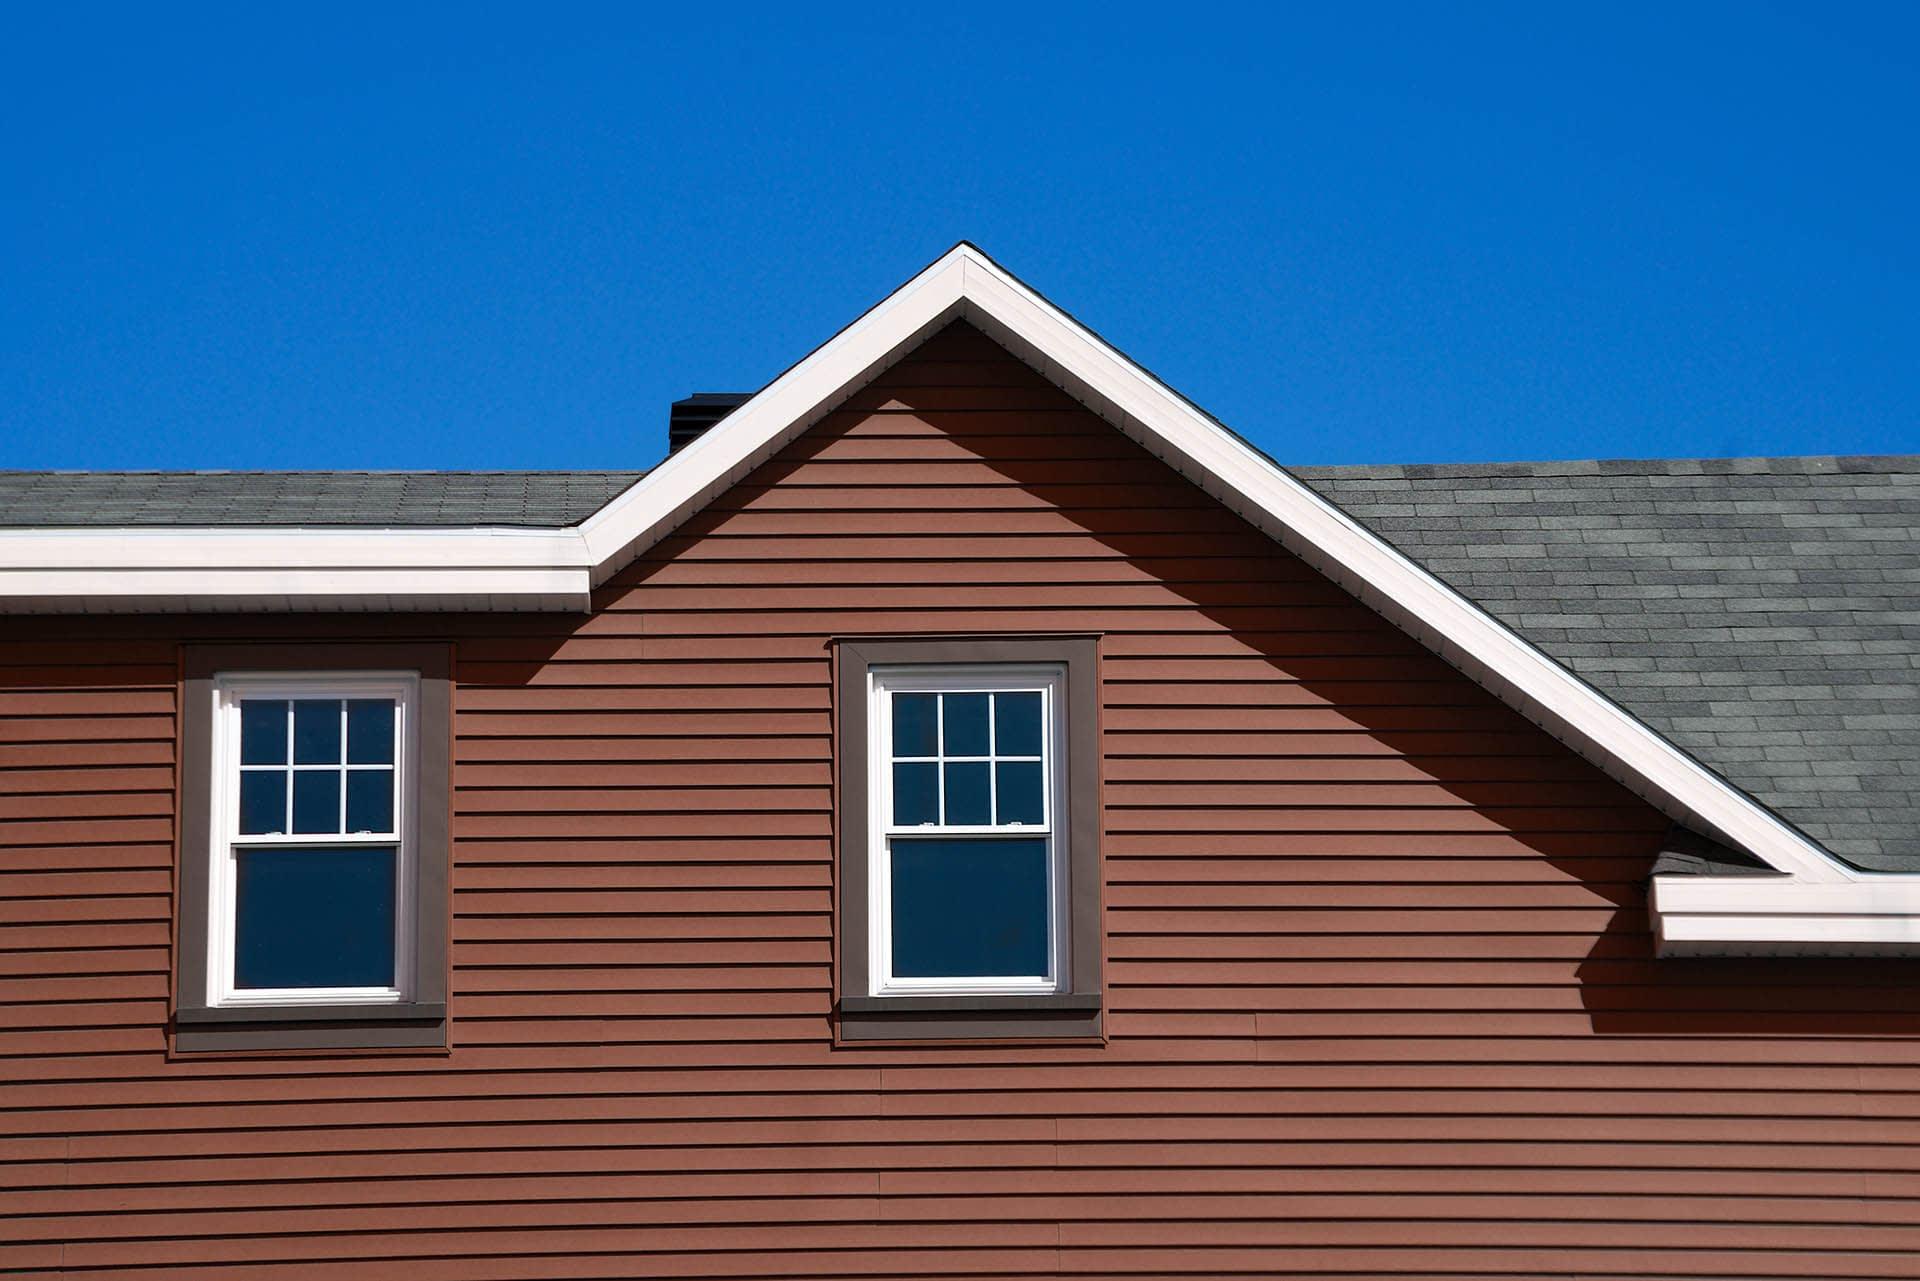 Composite Cladding on house with facade - composites alternatives